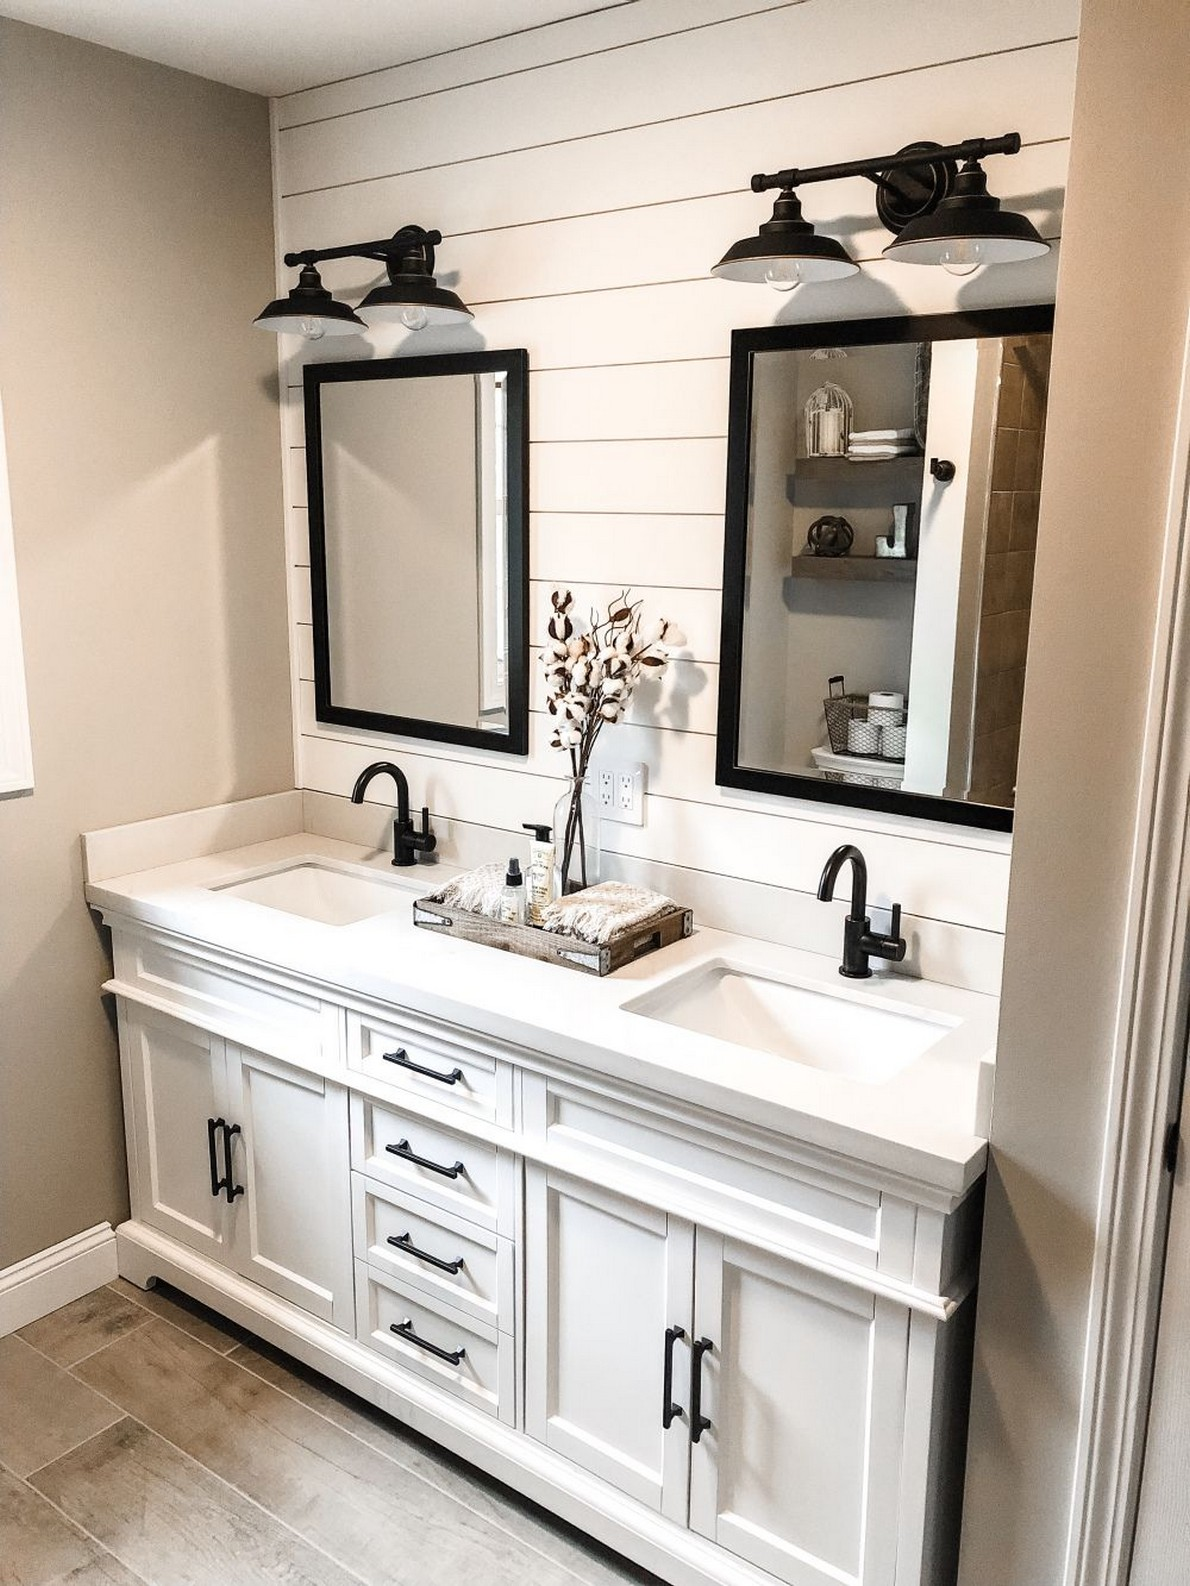 83 Modern Bathroom Design Some Tips Home Decor 30